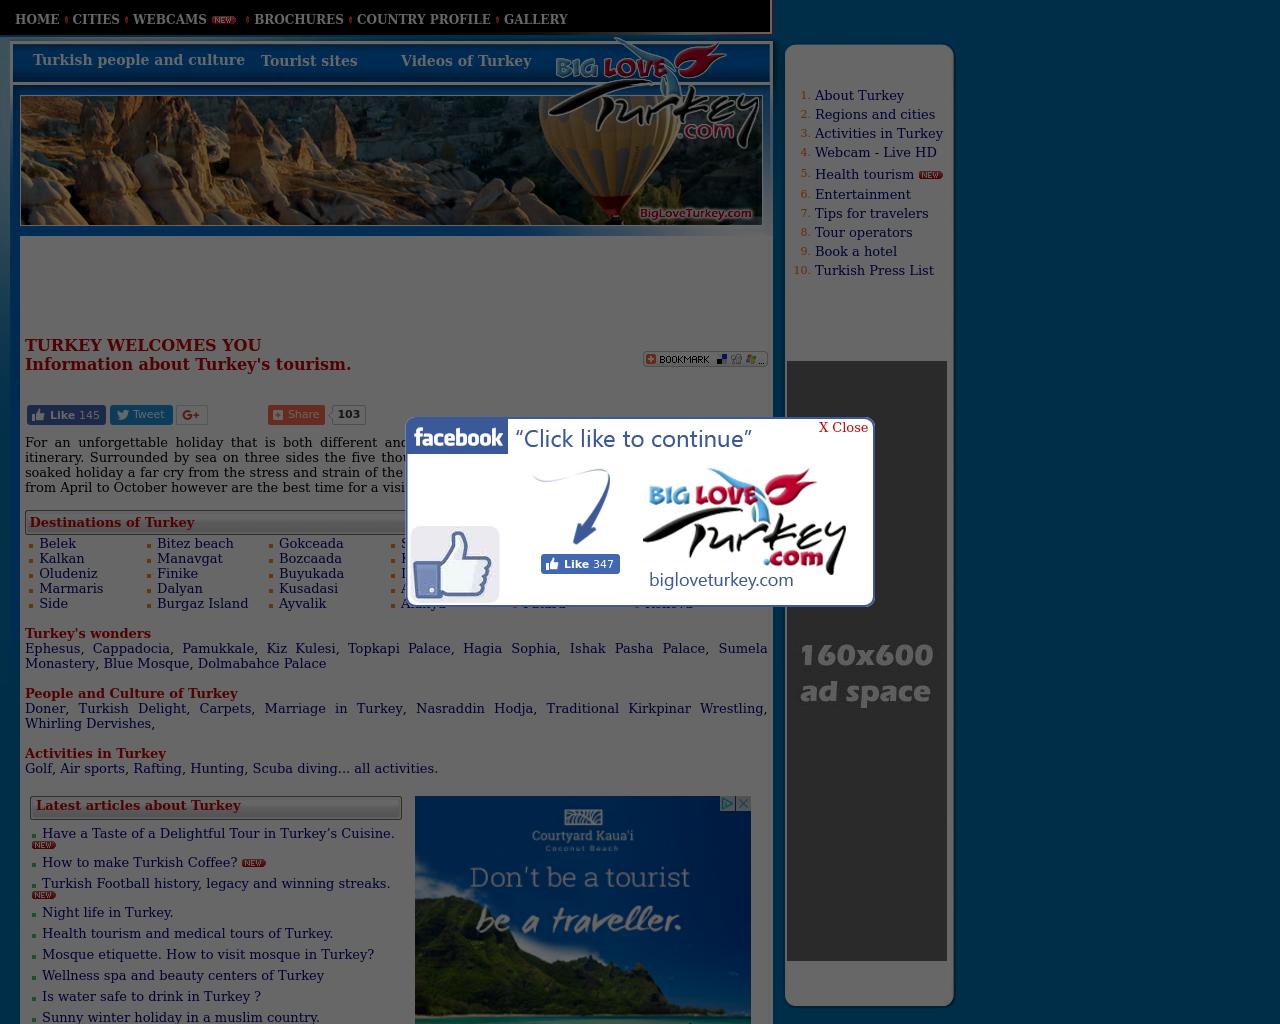 Big-Love-Turkey-.com-Advertising-Reviews-Pricing